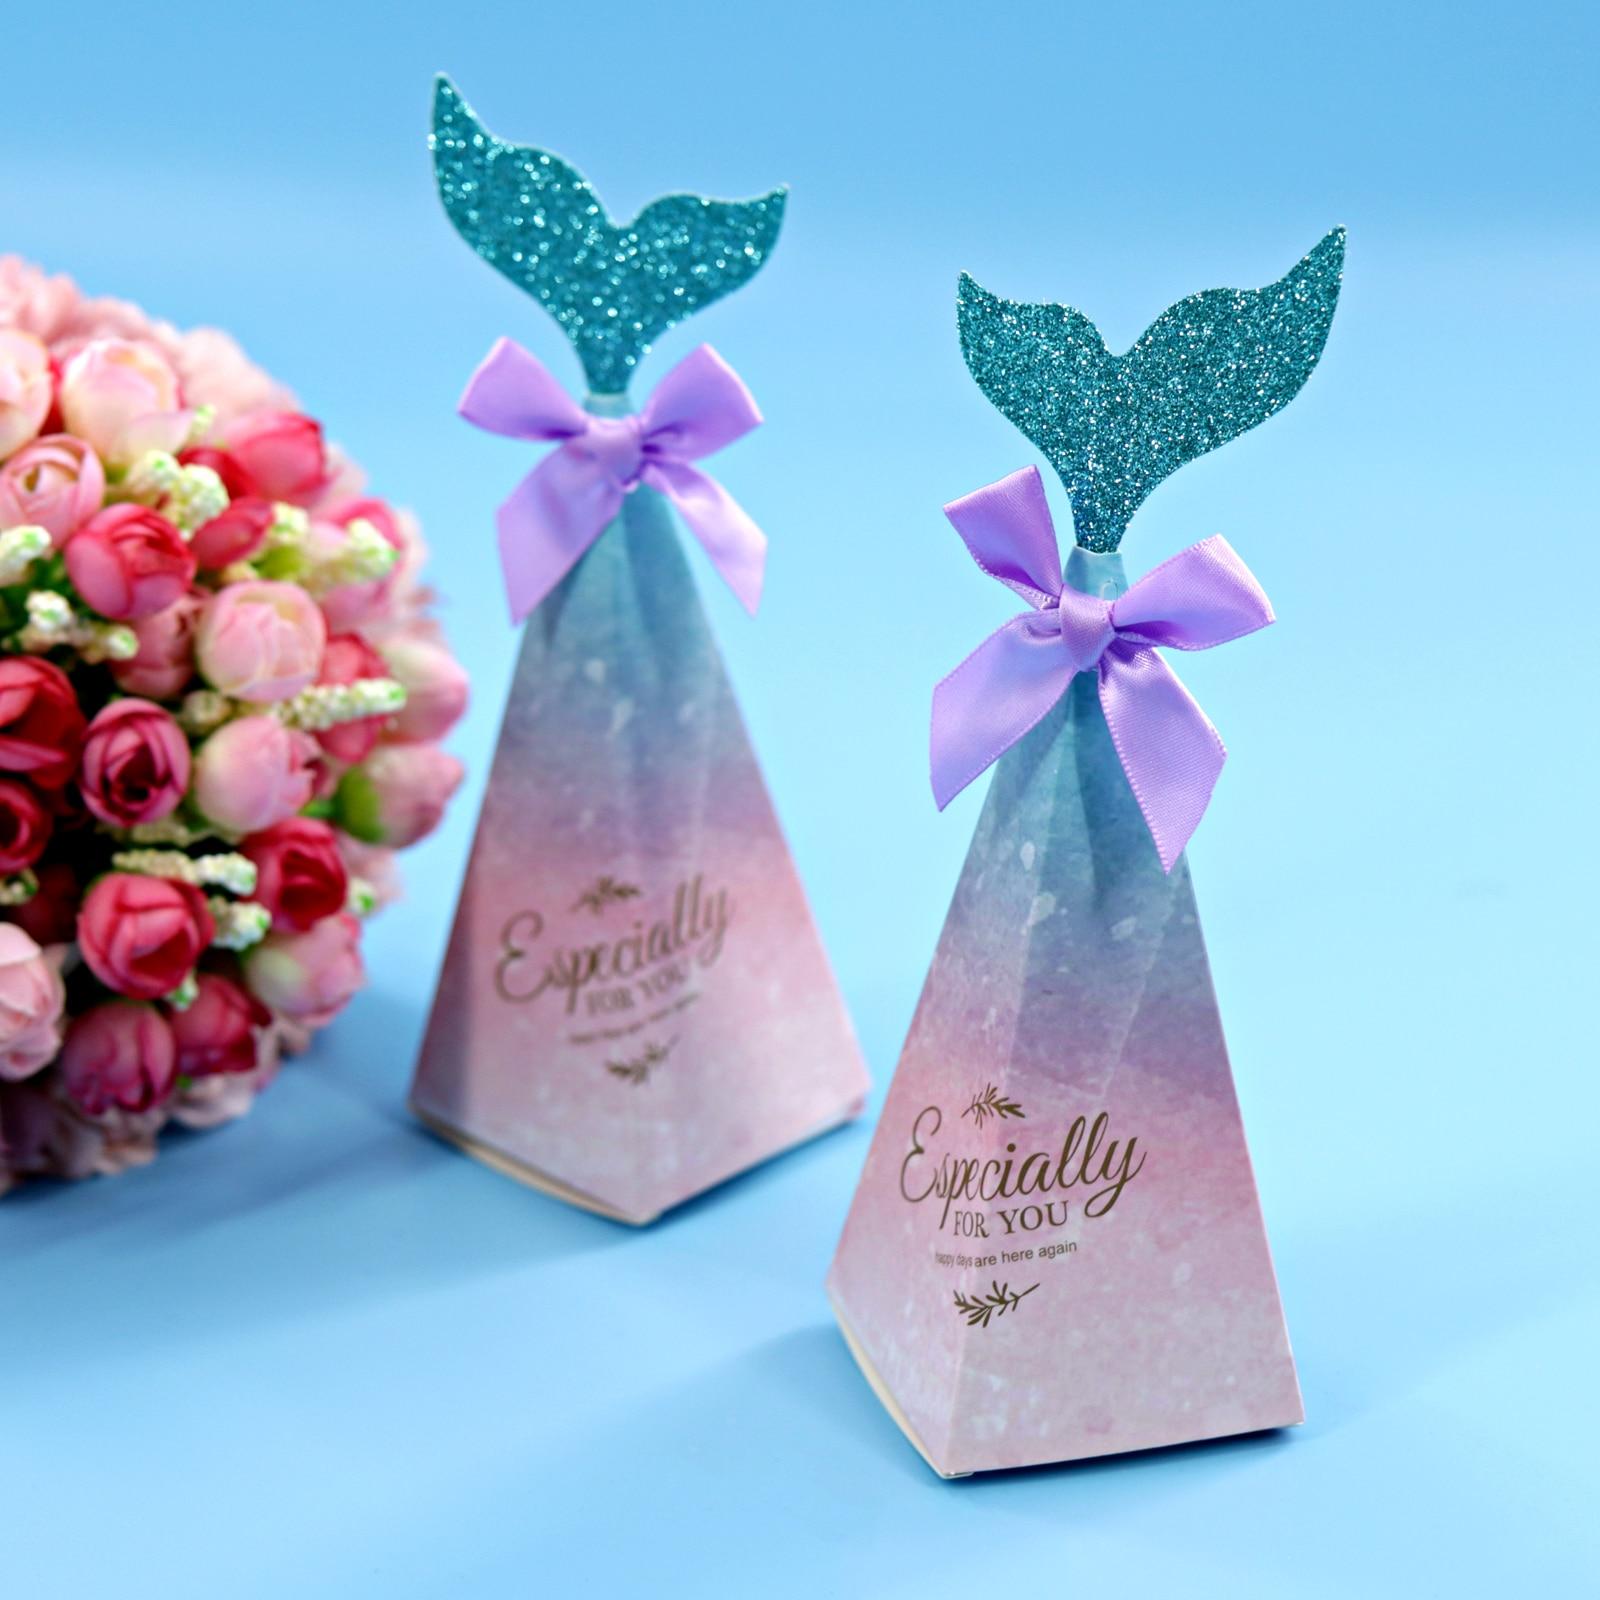 12pcs Mermaid Candy Box Paper Wedding Gift Box Baby Shower Birthday Favor Decor